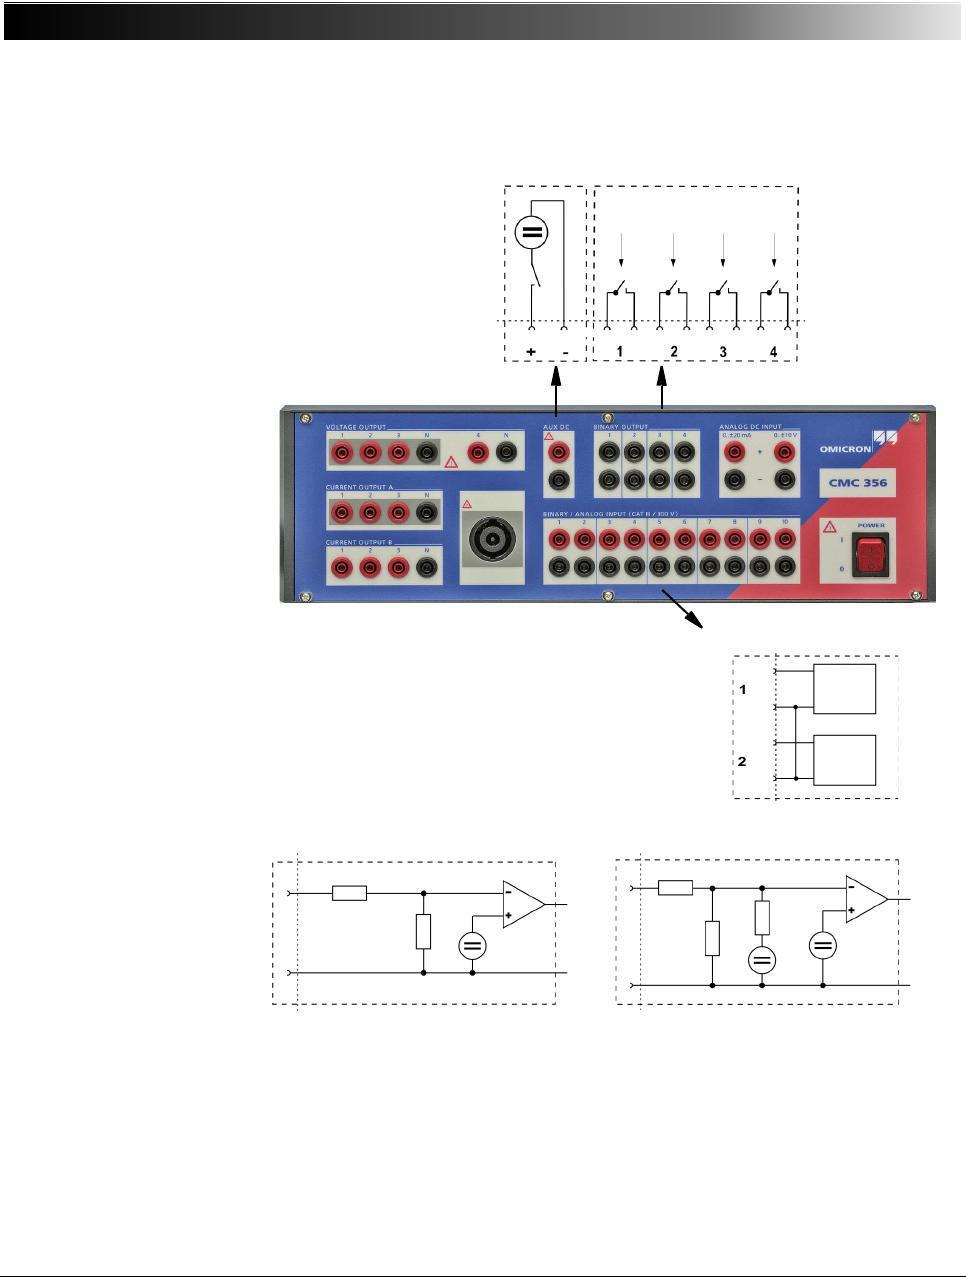 cmc electronic cmc 356 user manual download page 28 rh rsmanuals com Telent plc Iomax Archangel